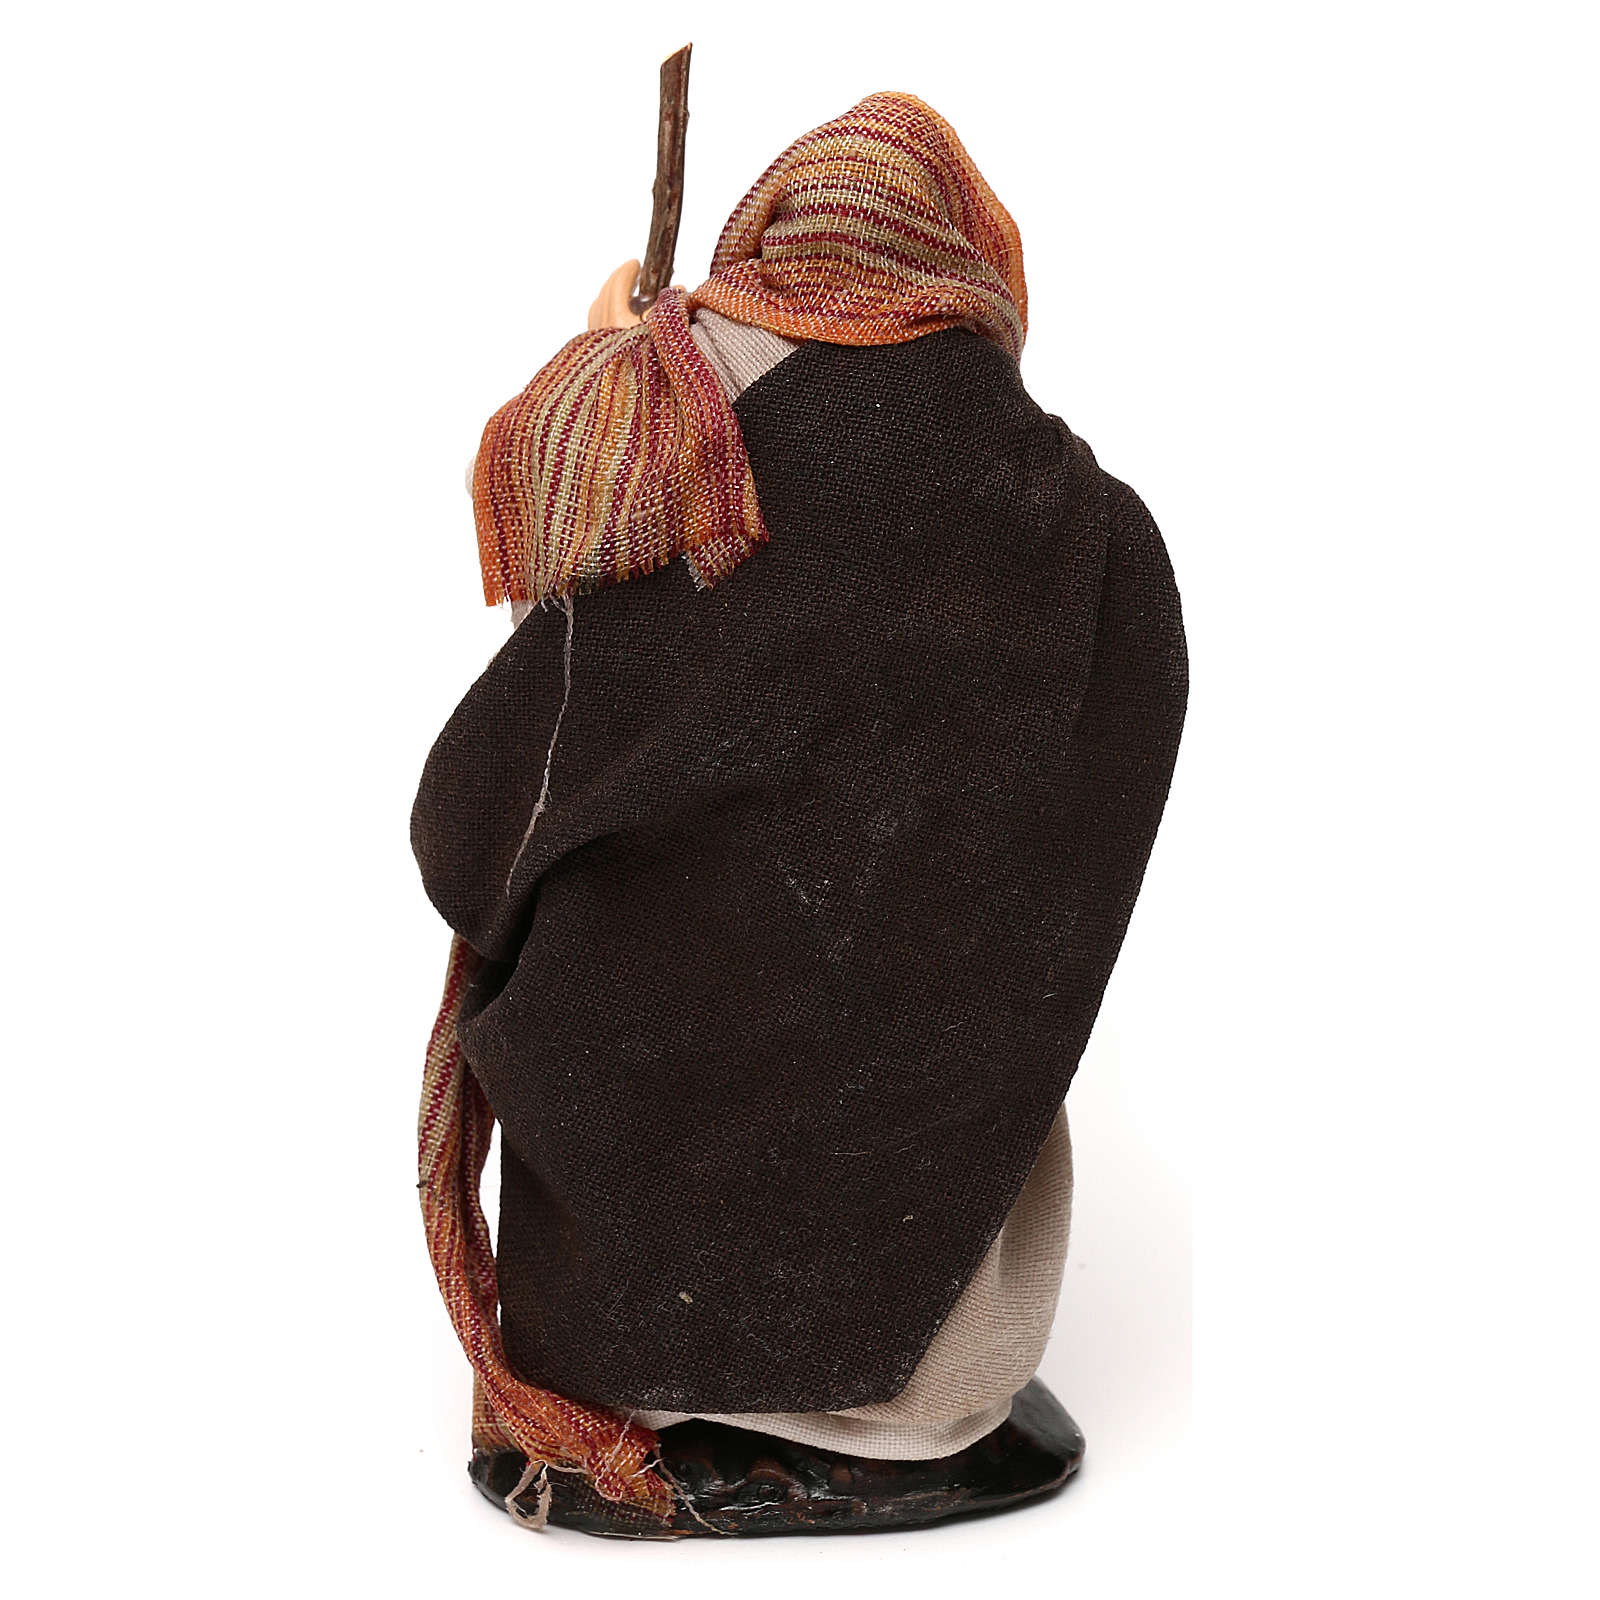 Heiliger Josef mit Stock 12cm neapolitanische Krippe 4